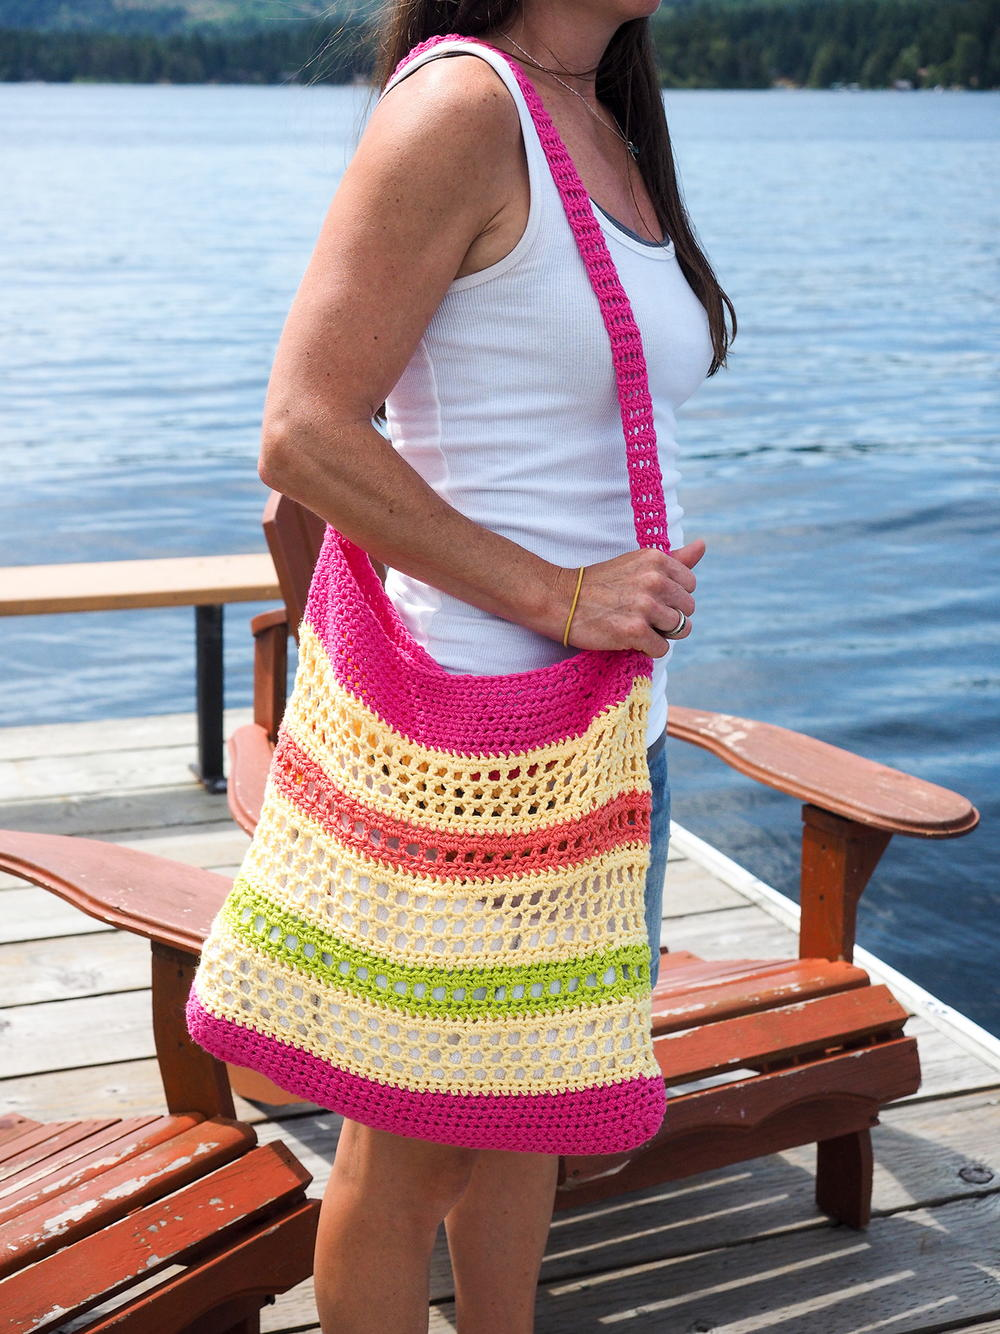 Crochet Beach Tote Bag Pattern | FaveCrafts.com